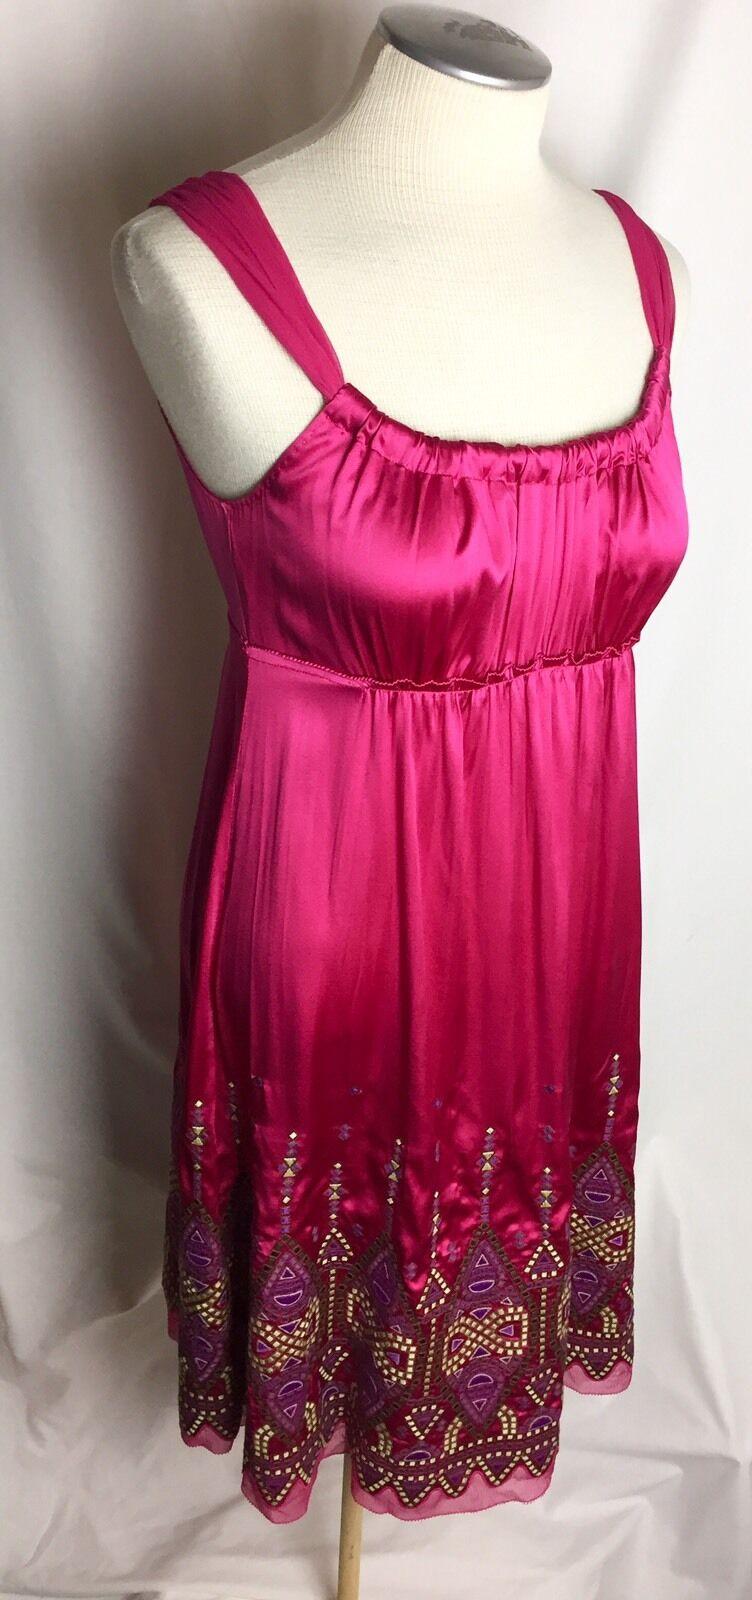 NWT ELIE TAHARI Silk Magenta Rosa Embroiderot Dress Größe 2